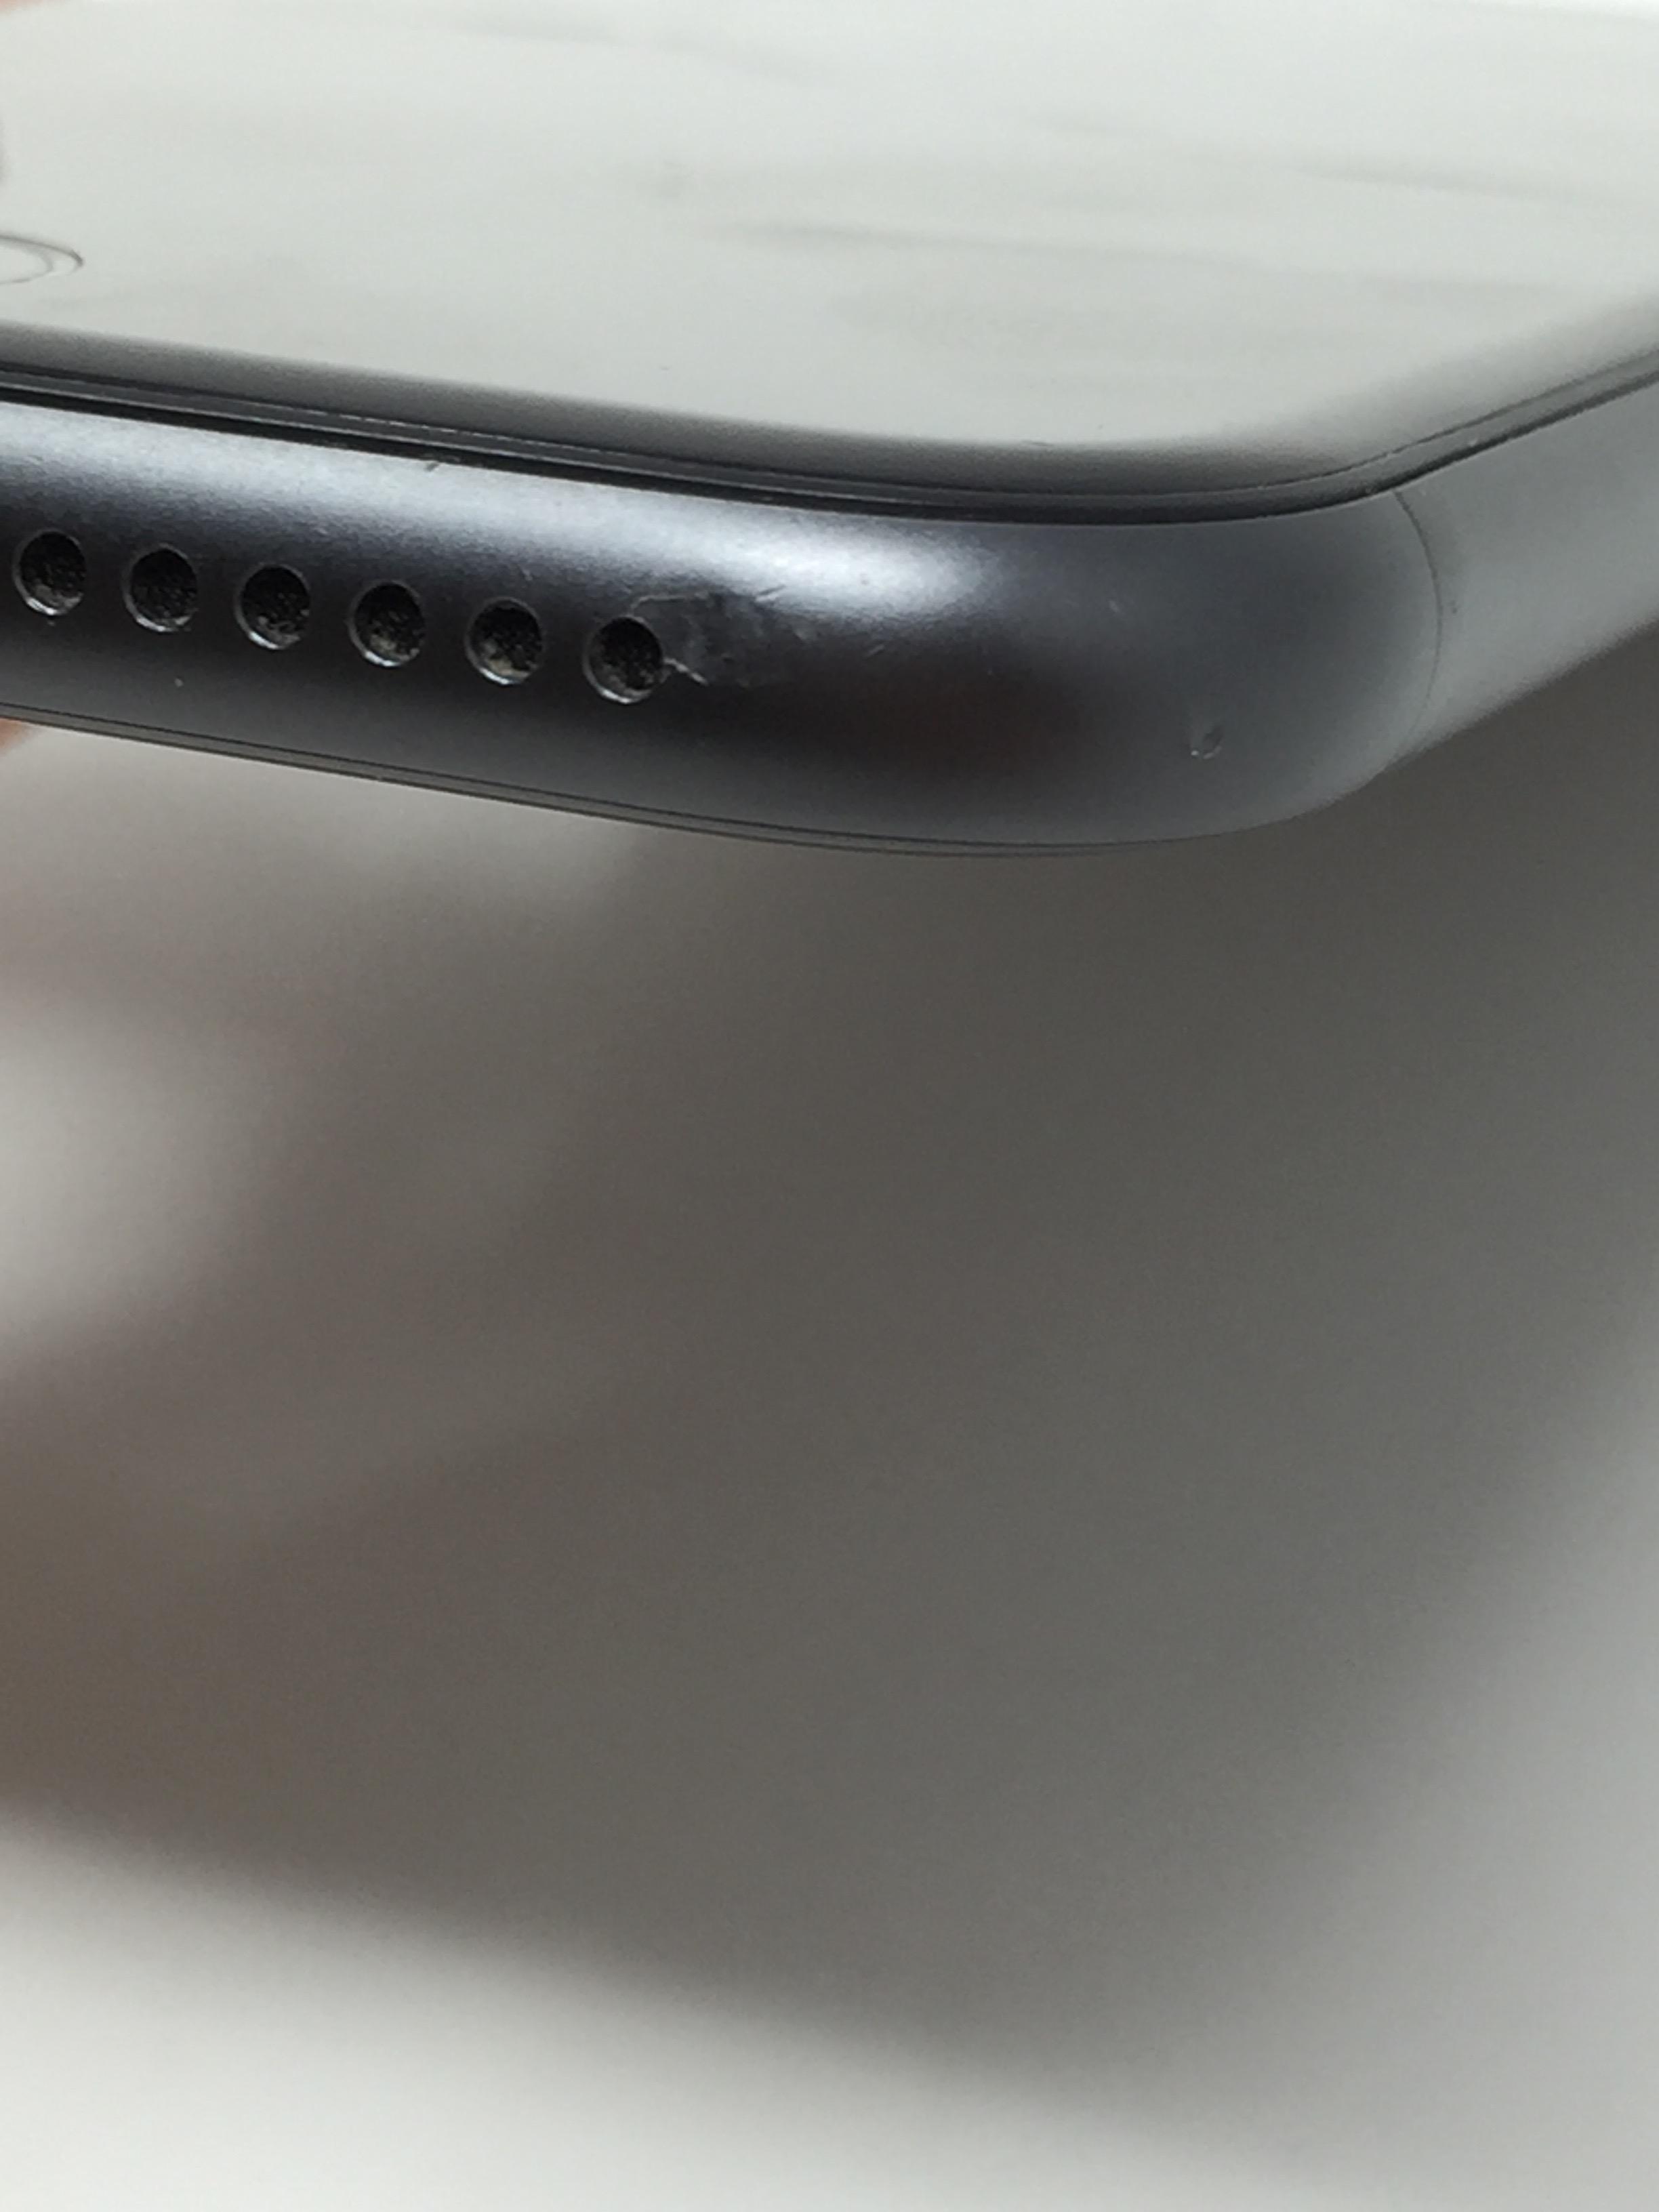 iPhone 8 64GB, 64 GB, SPACE GRAY, imagen 3